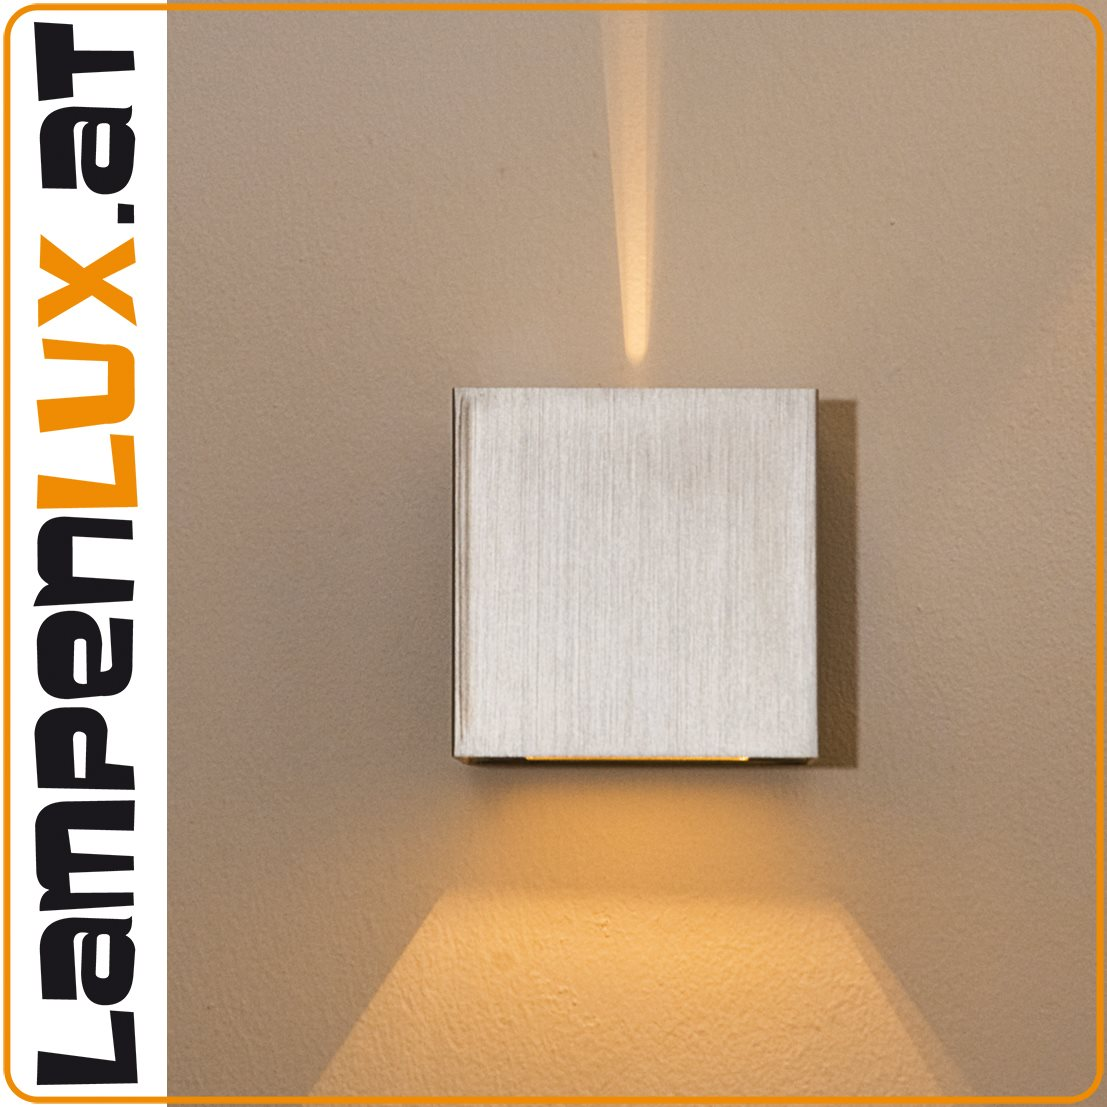 Lampenlux LED Up/Down Wandleuchte Wandlampe Amon breit-schmal Stimmungslicht silber G9 4W